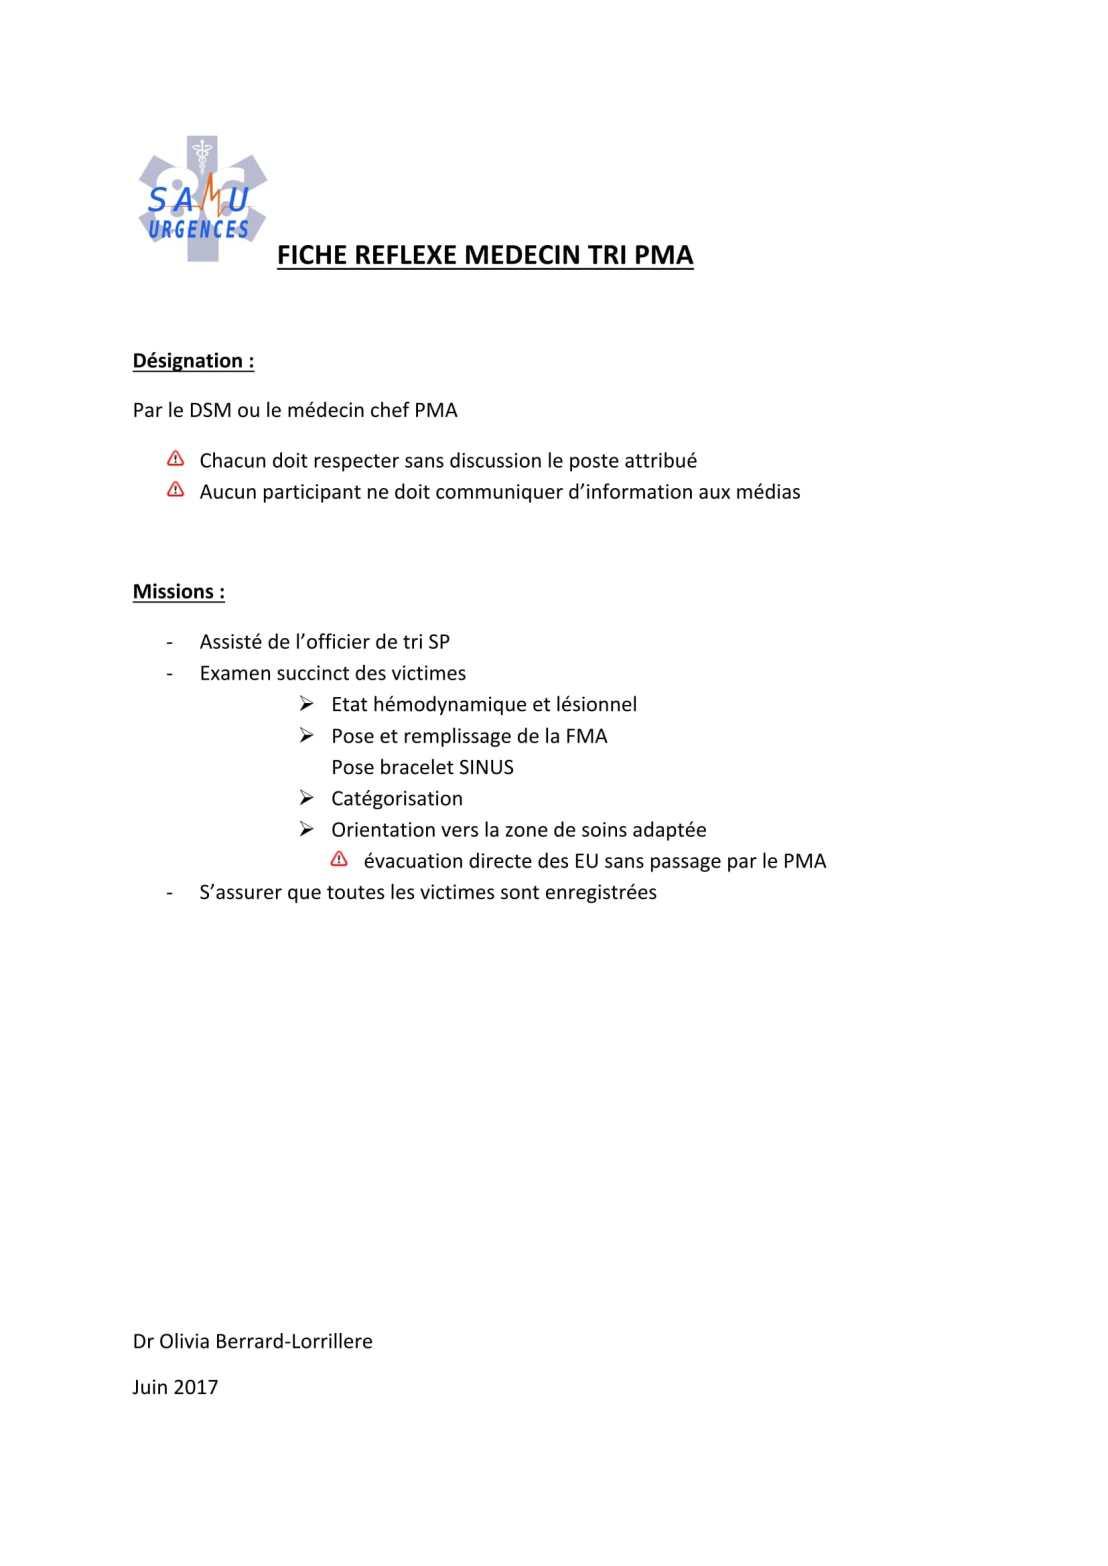 medecintri_reflexe-1